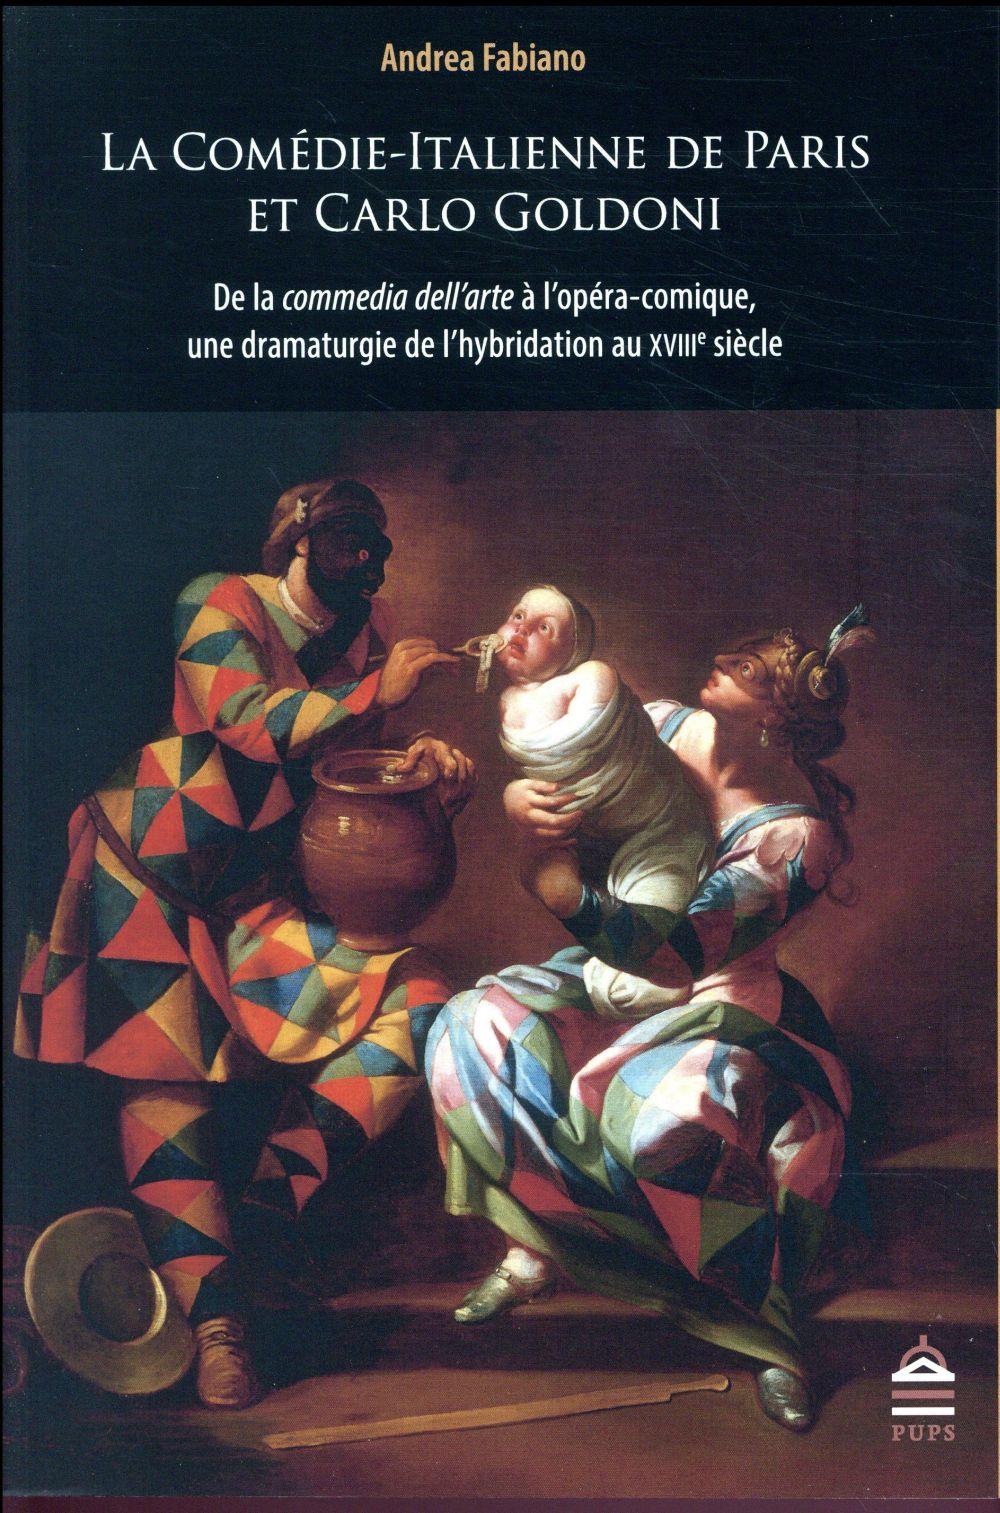 LA COMEDIE-ITALIENNE DE PARIS ET CARLO GOLDONI - DE LA COMMEDIA DELL'ARTE A L'OPERA-COMIQUE, UNE DRA